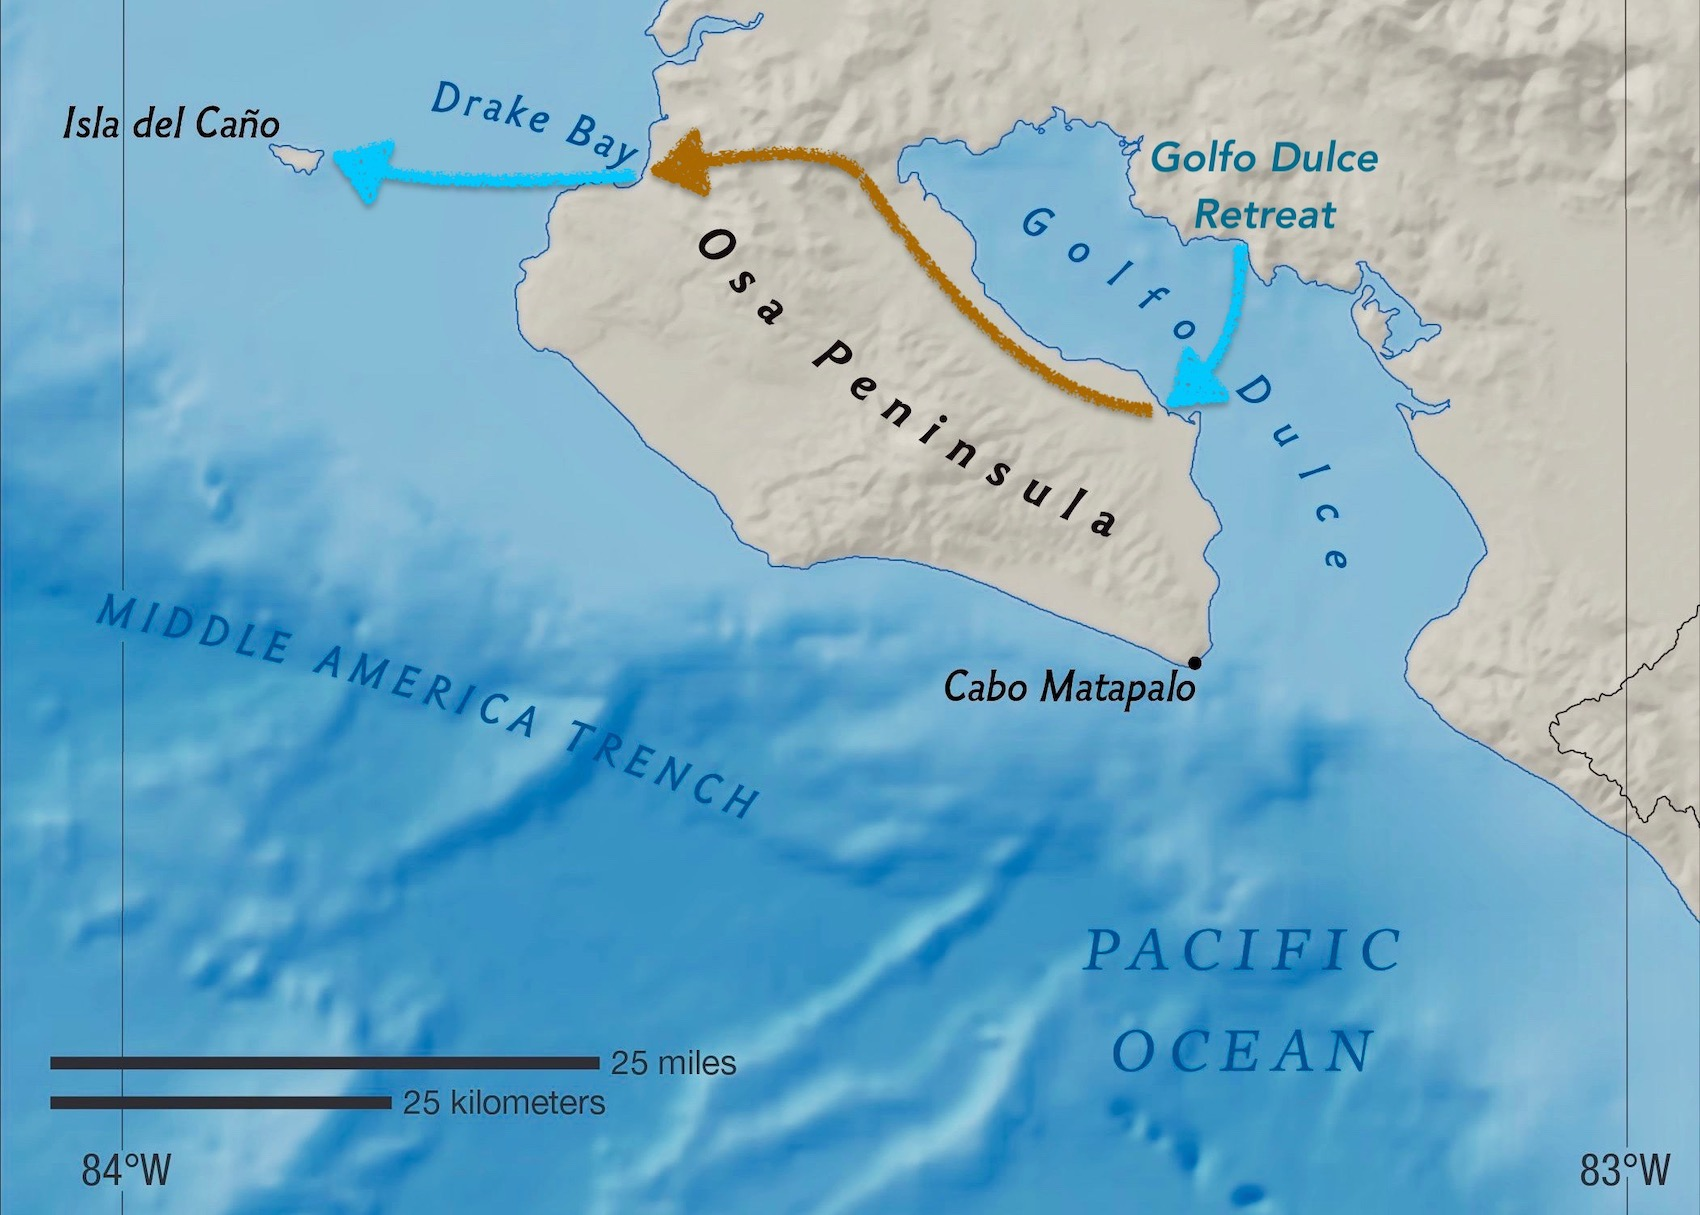 isla del cano nat geo.jpeg